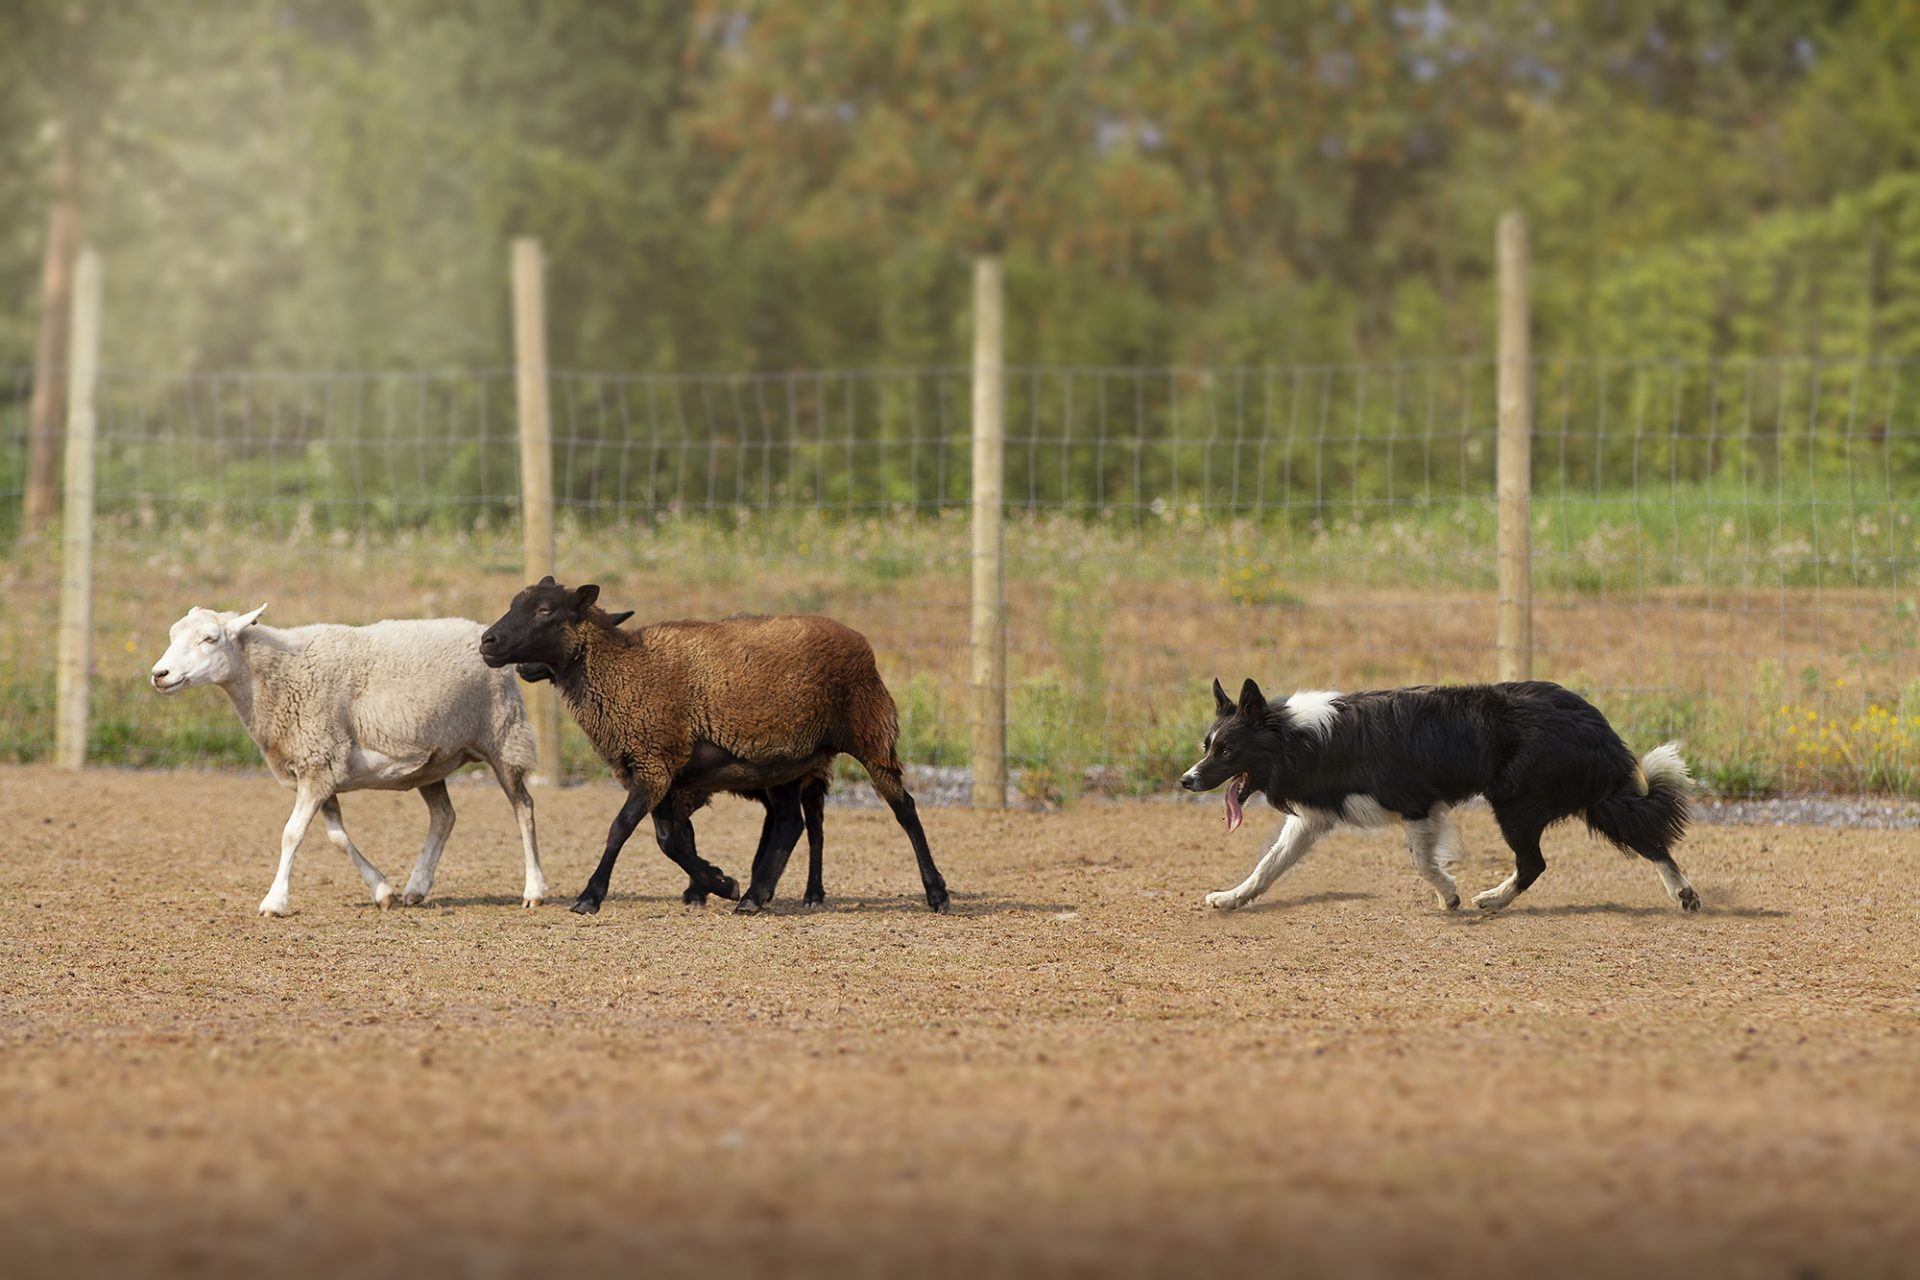 border collie dog working herding sheep